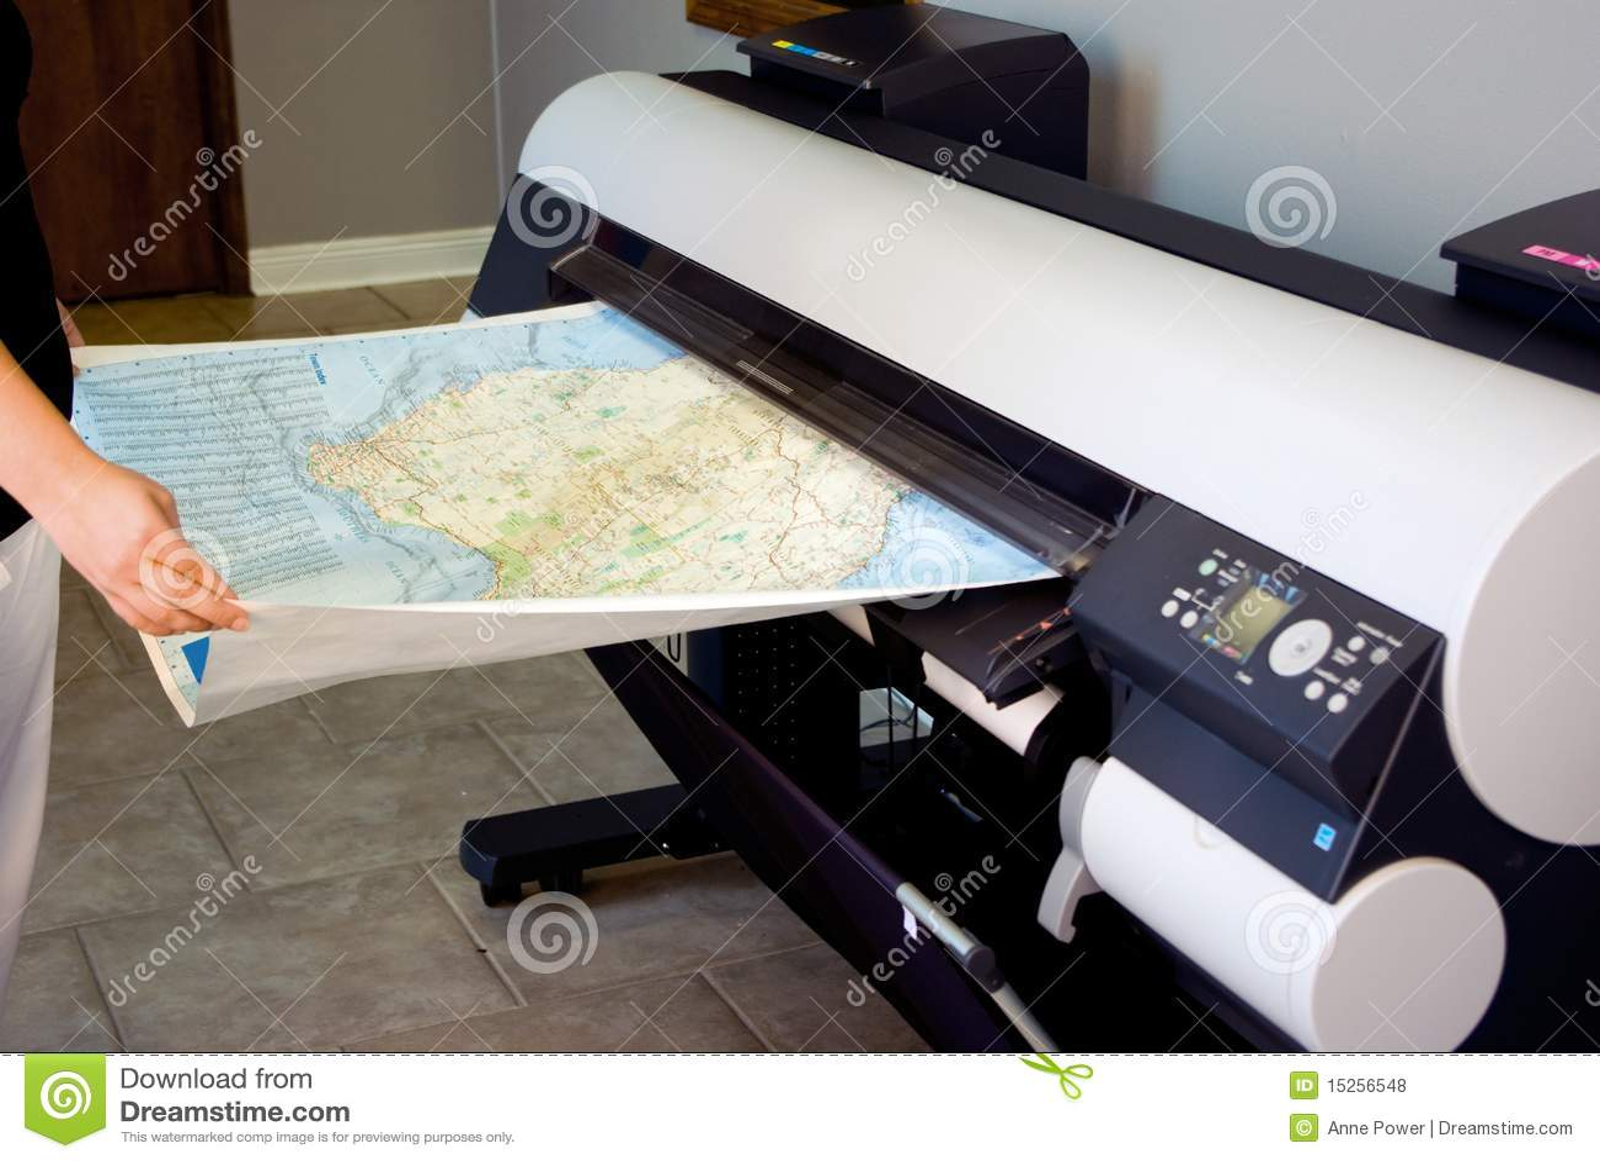 Wide Format Printer (Plotter)